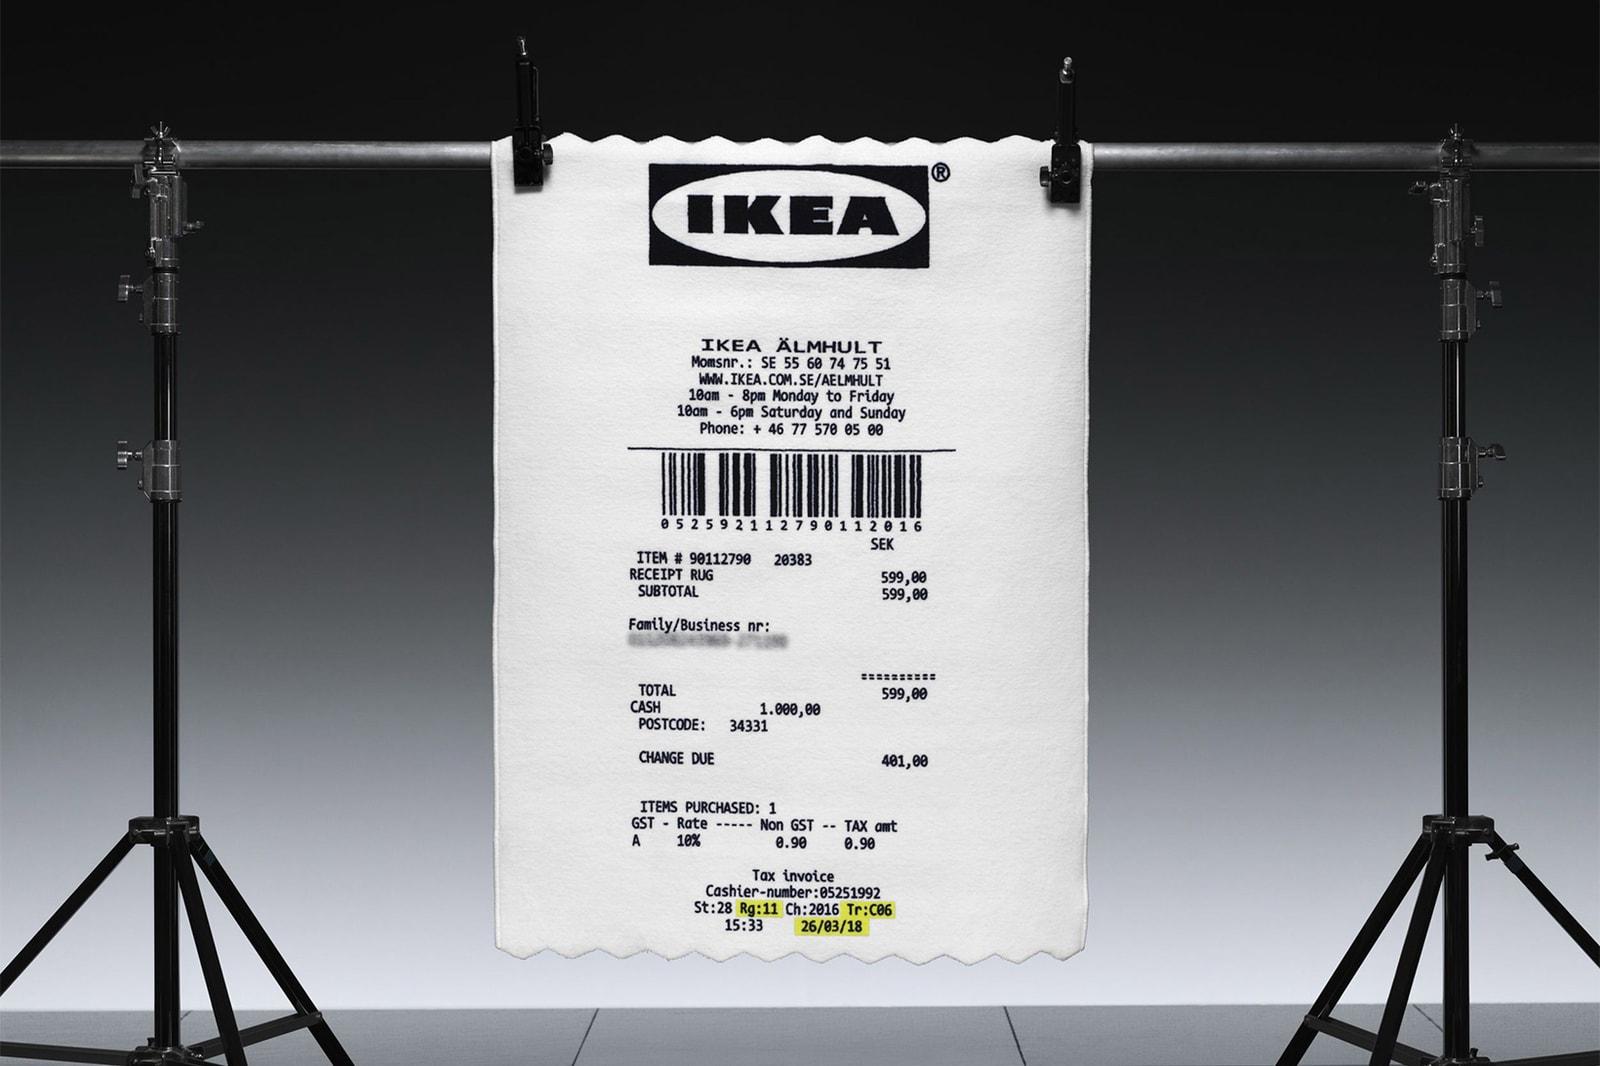 HYPEBEAST 獨家專訪 Virgil Abloh 談及 IKEA 合作系列並回應「抄襲」質疑